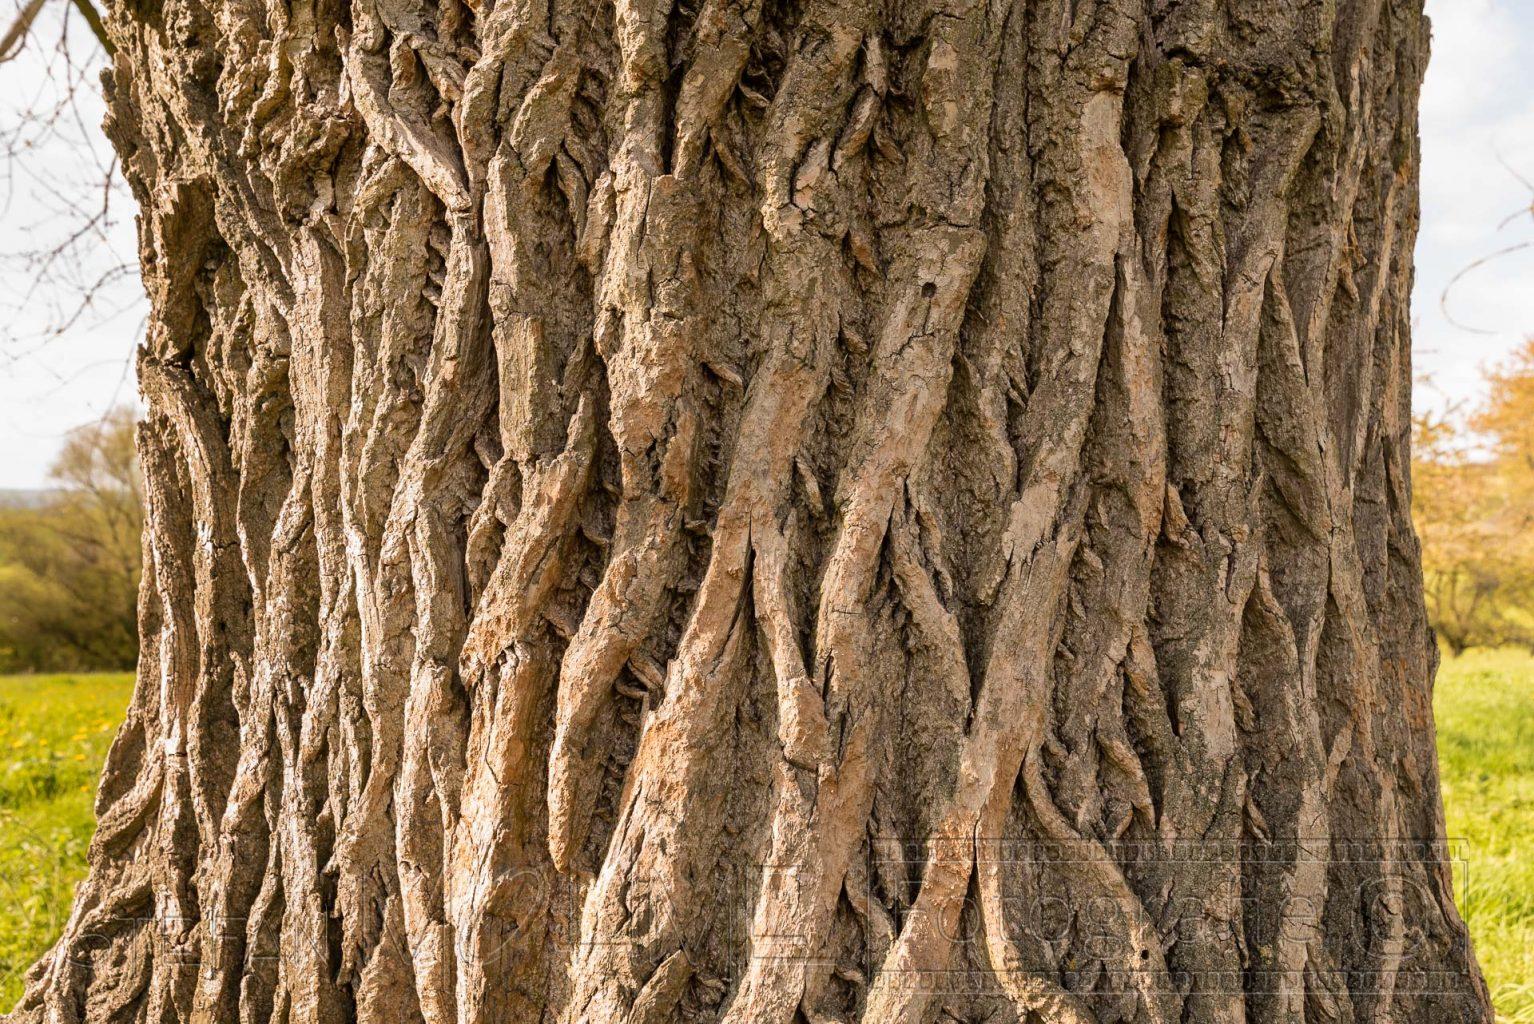 Baum, rinde,nahaufnahme,natur,details